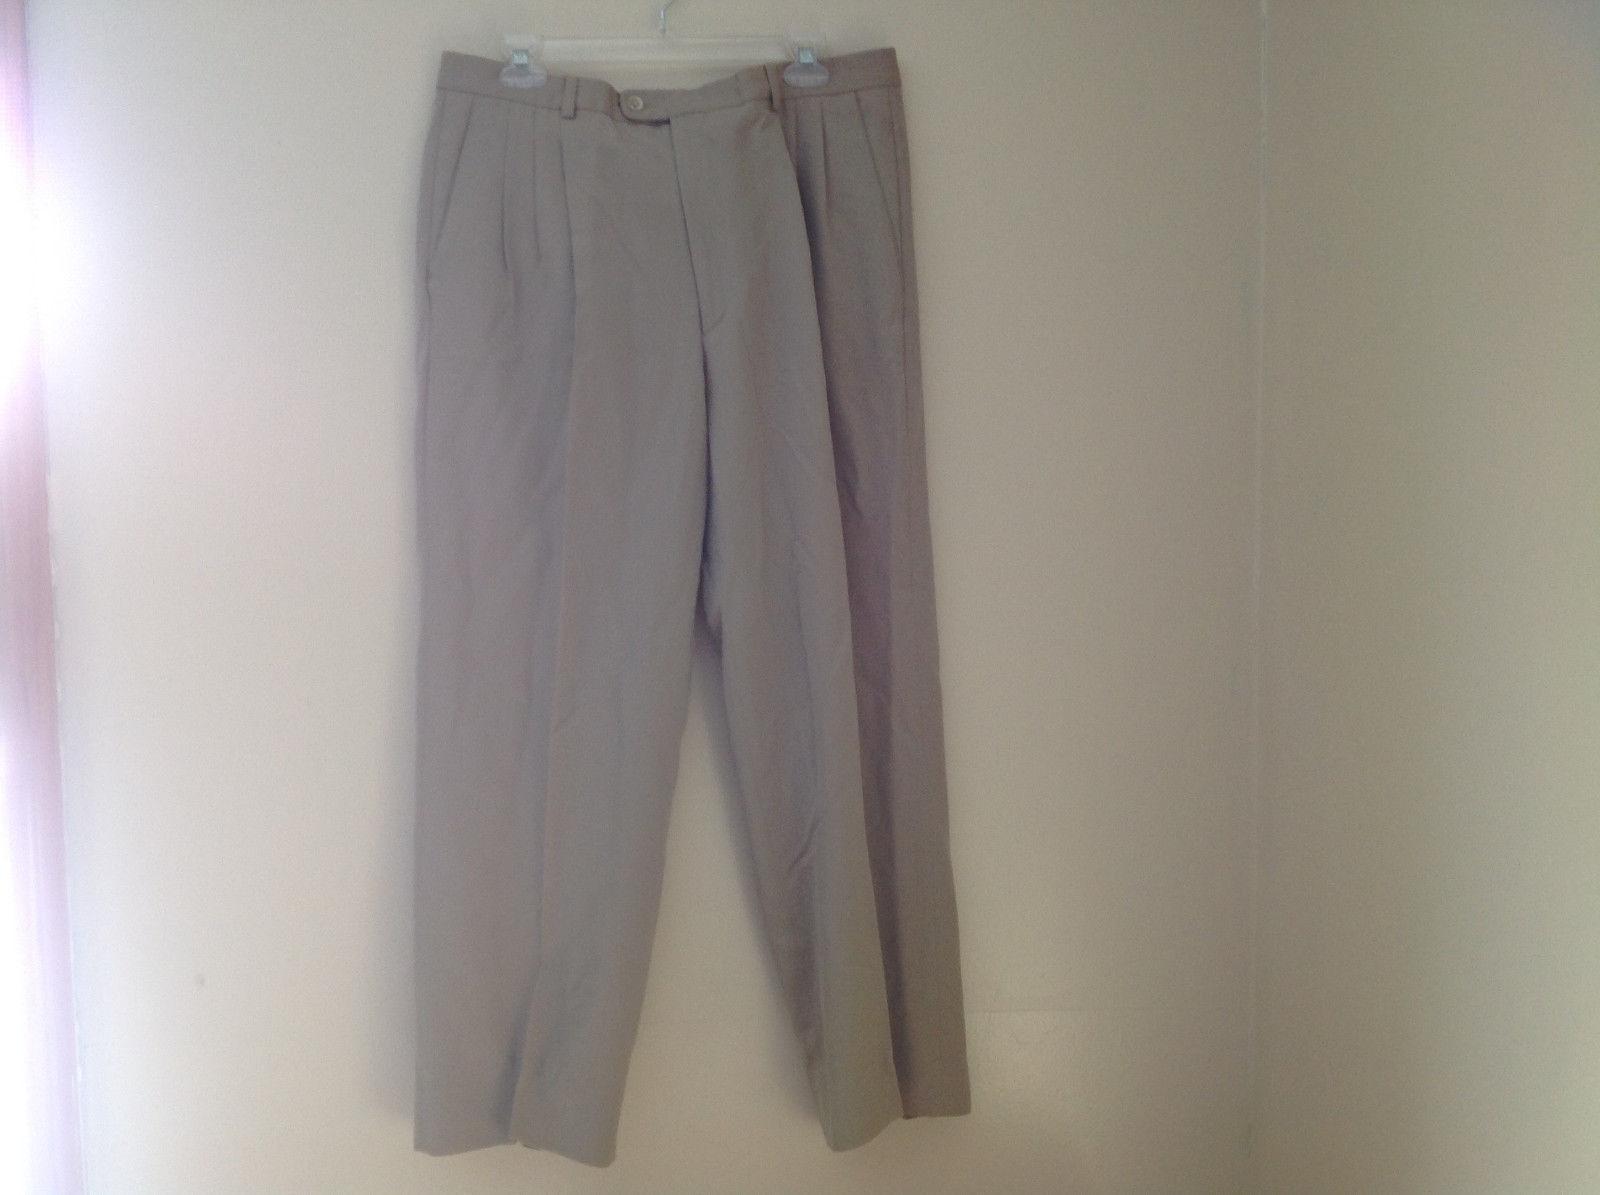 Zanella Khaki Pleated Dress Slacks 3 Pockets See Measurements Below